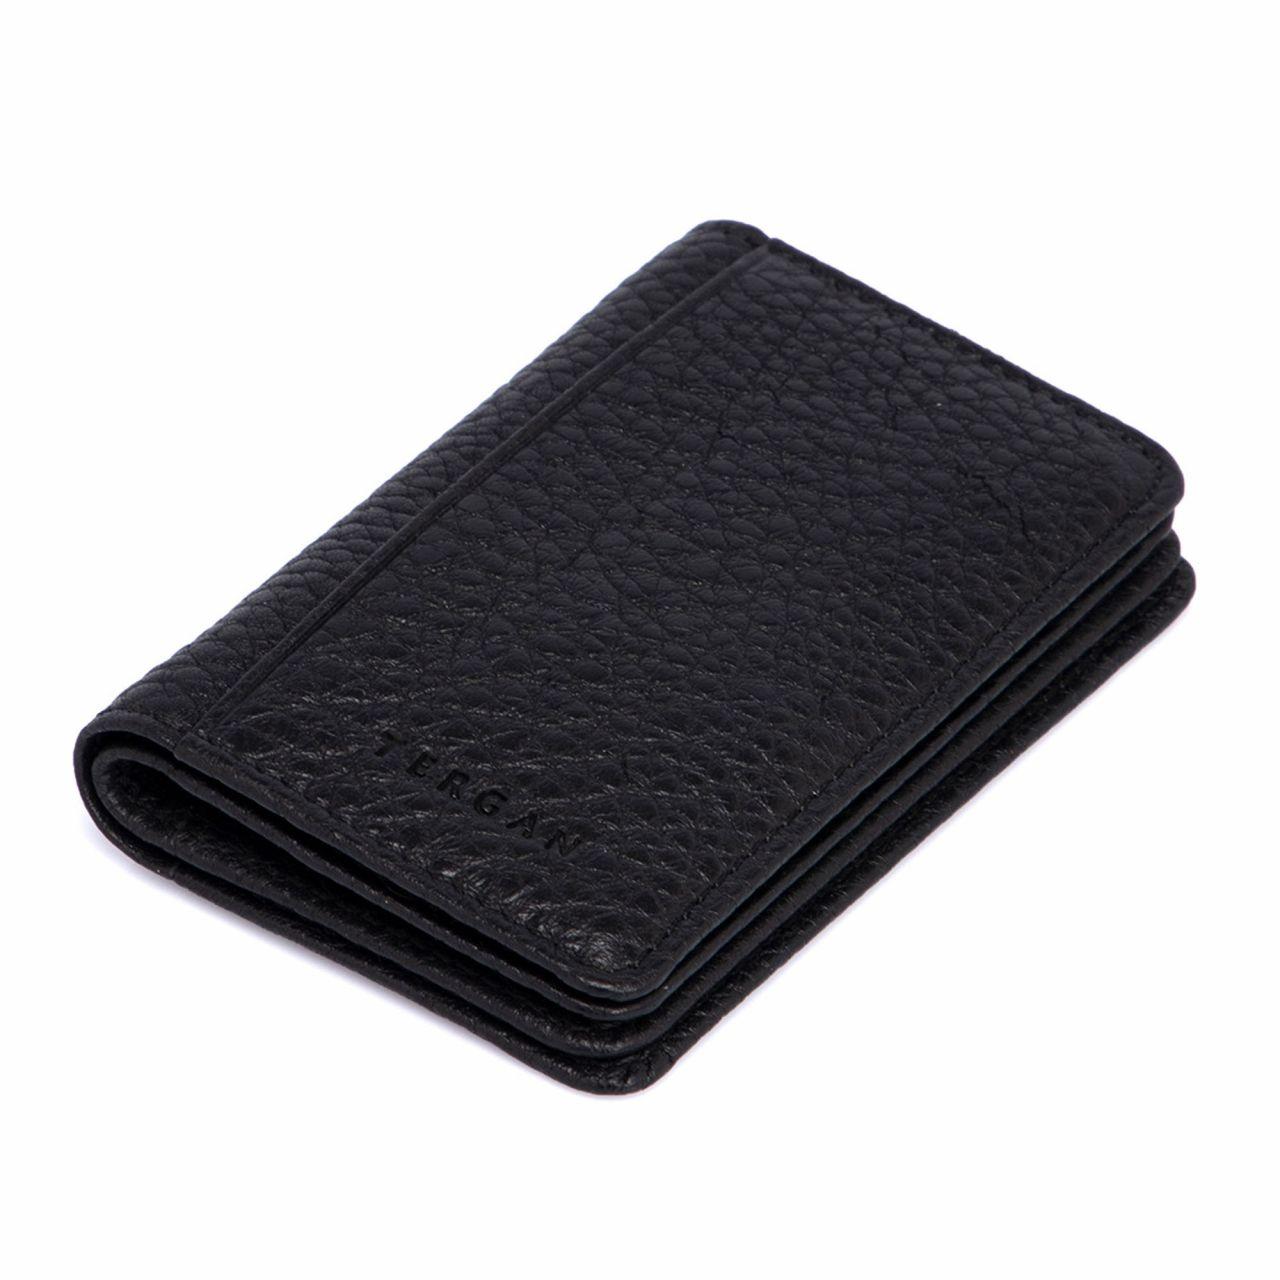 Genuine Leather Credit Cards Holder